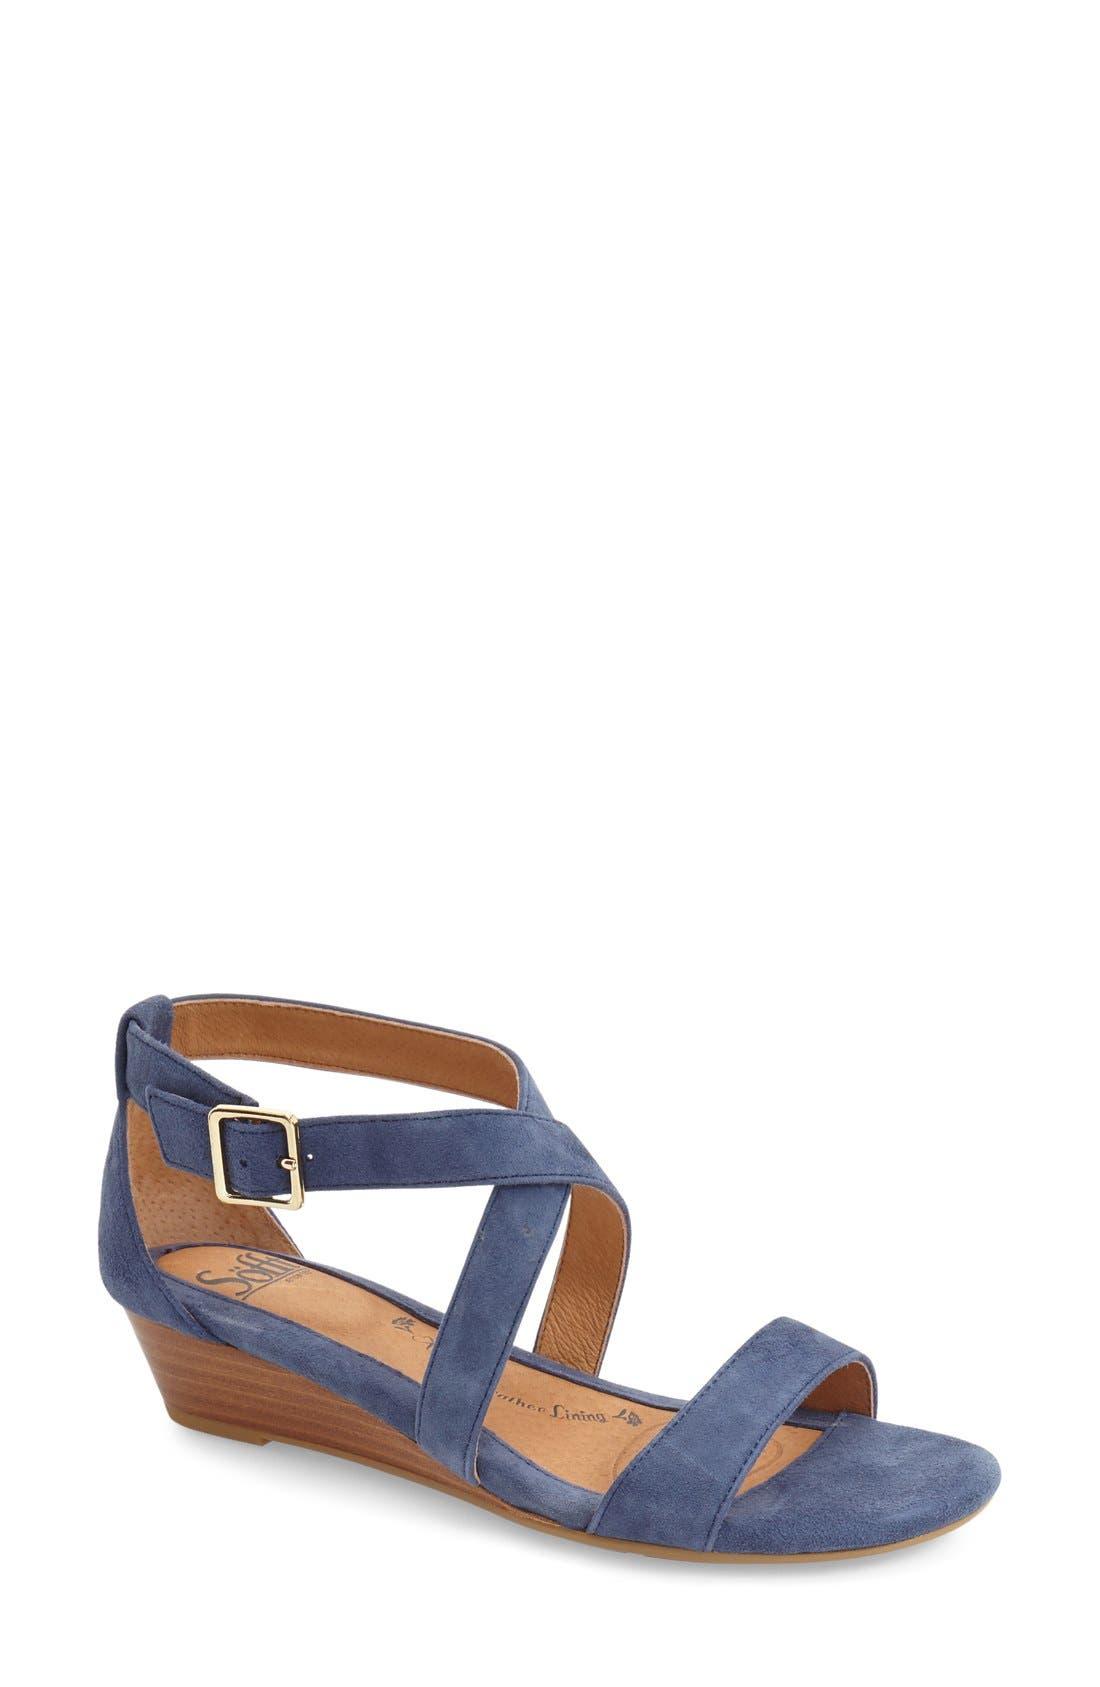 'Innis' Low Wedge Sandal,                             Main thumbnail 10, color,